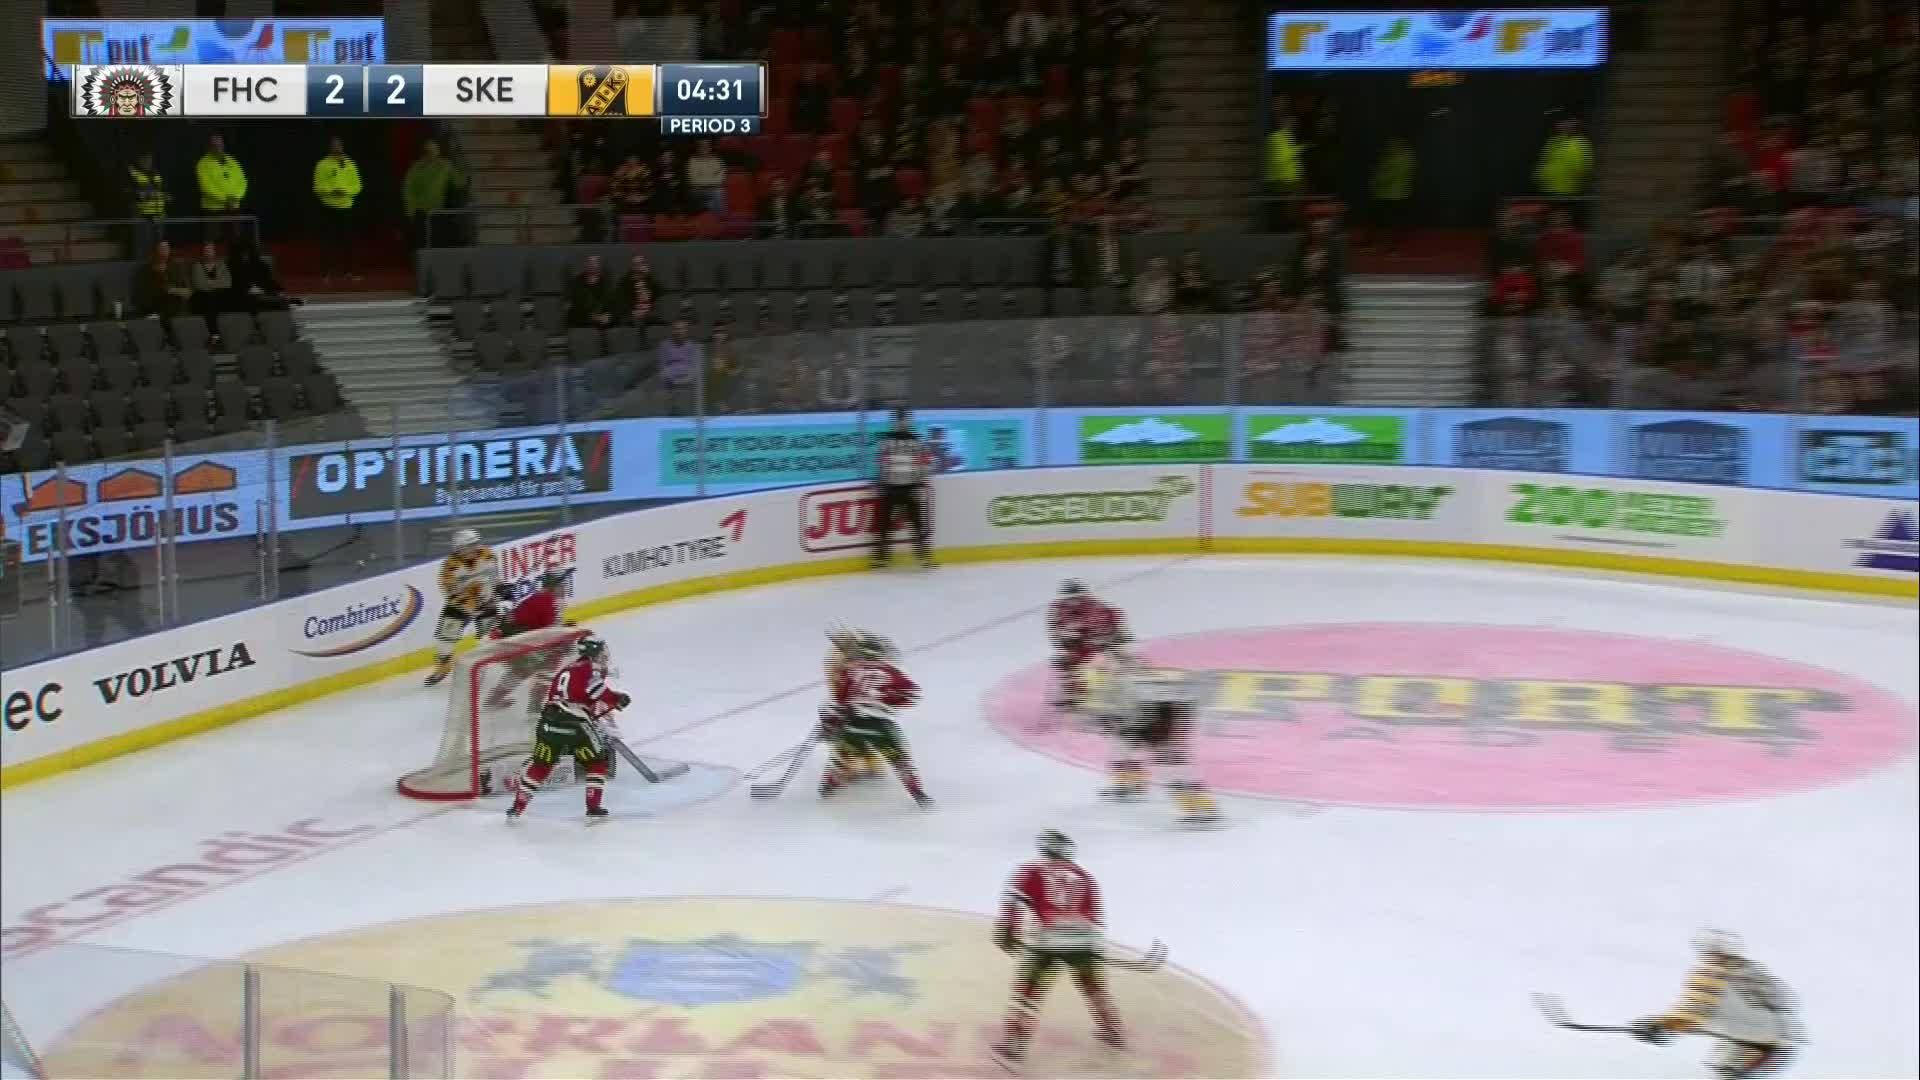 Frölunda HC - Skellefteå AIK 2-3